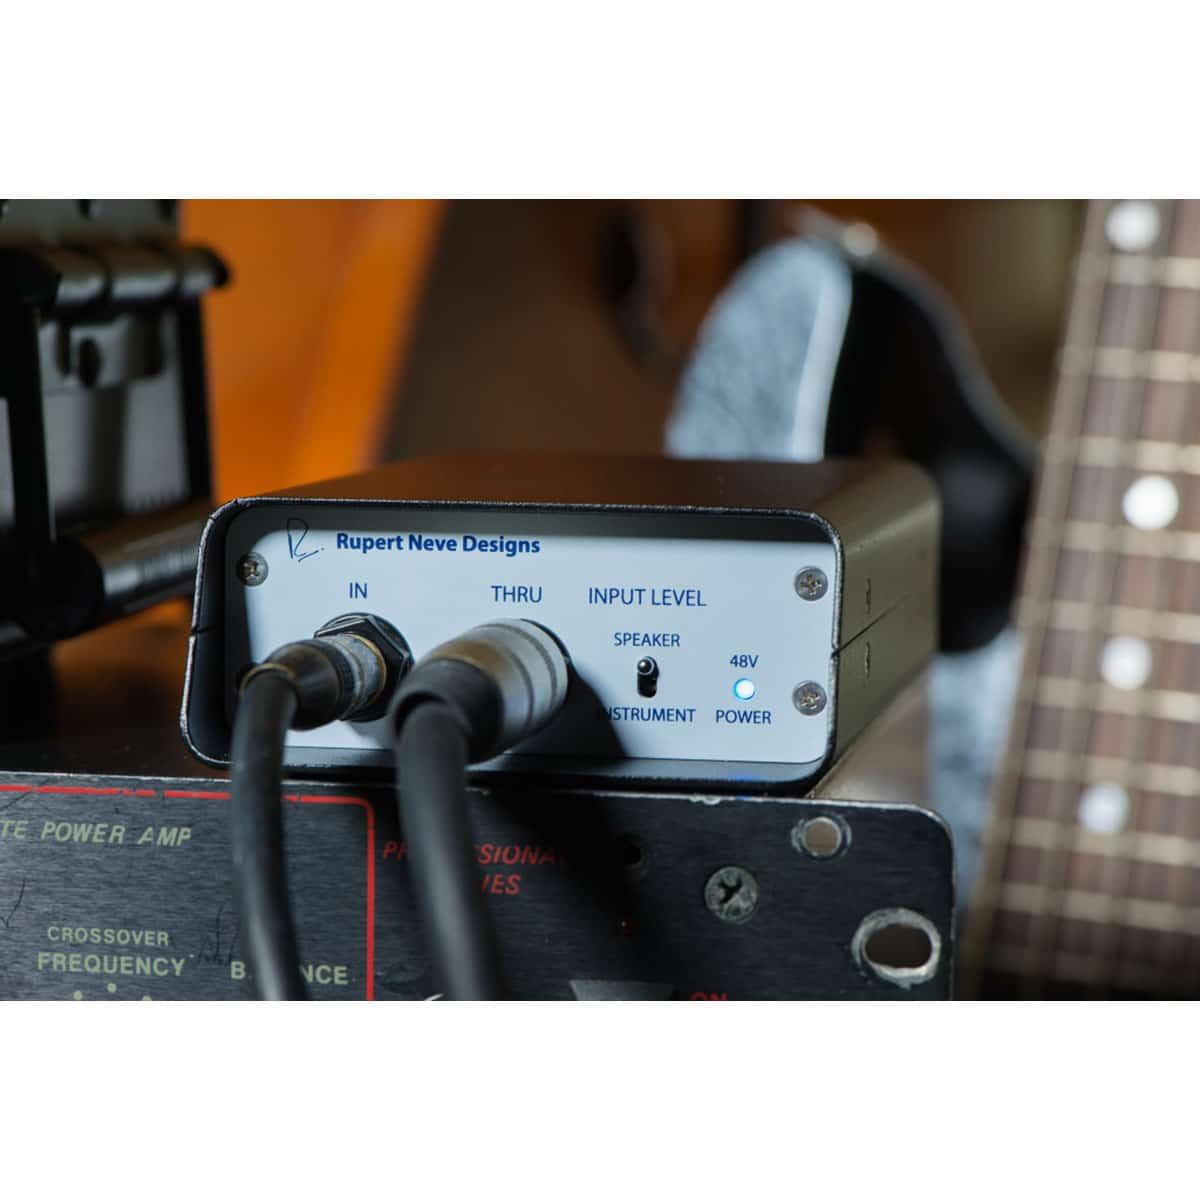 Rupert Neve RNDI 05 Pro Audio, Outboard, D.I./Reamp